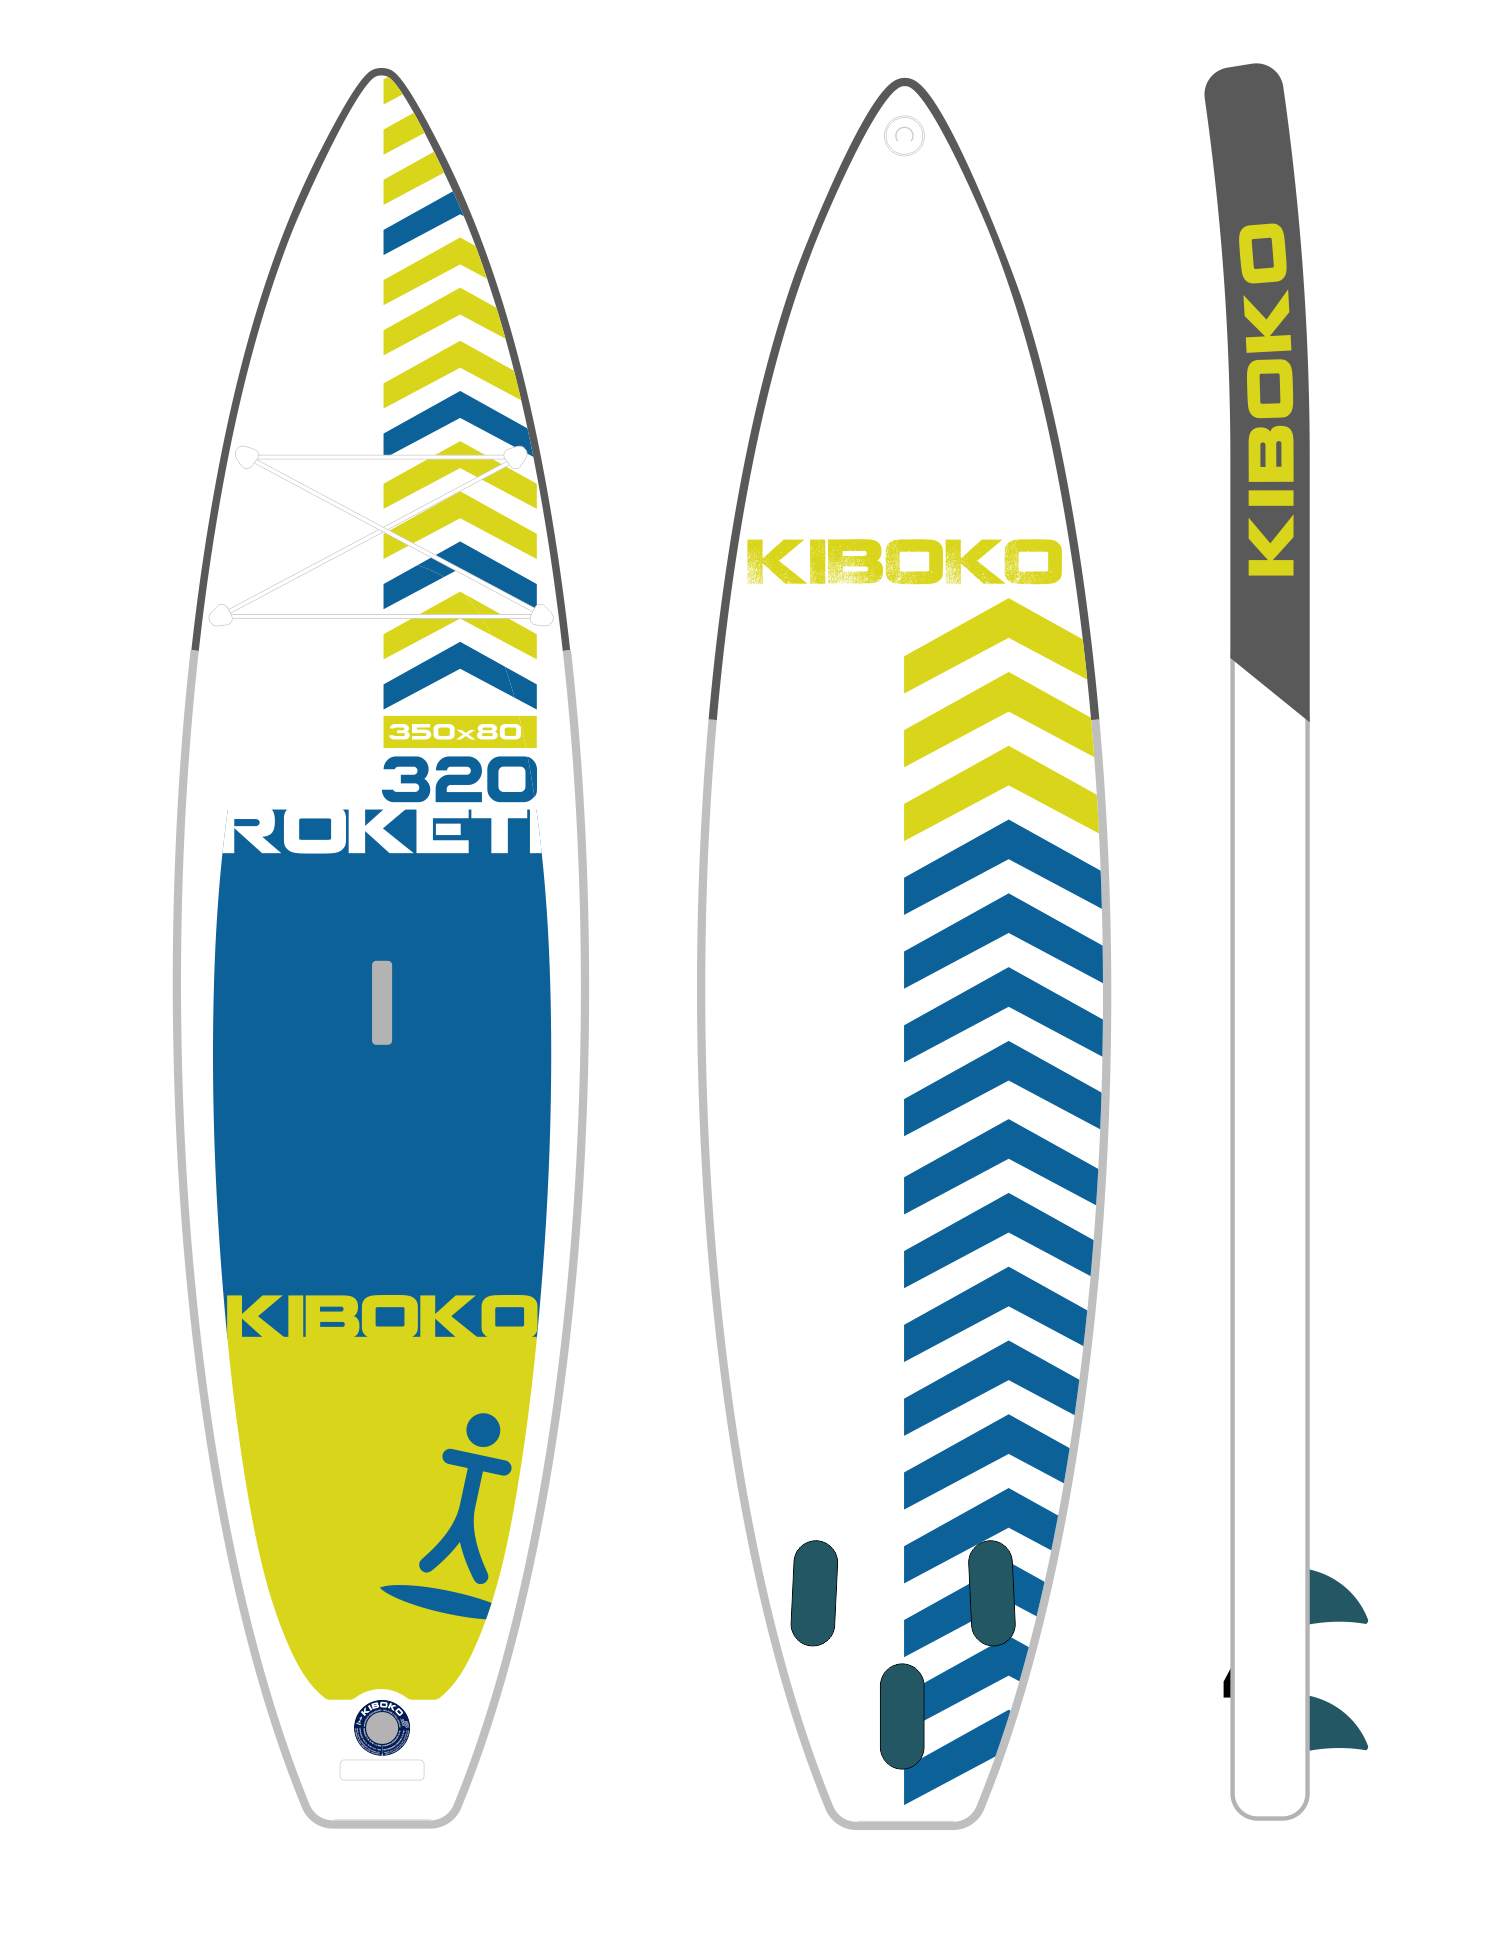 Kiboko Roketi 320 FT 3 Fin Yellow/Blue